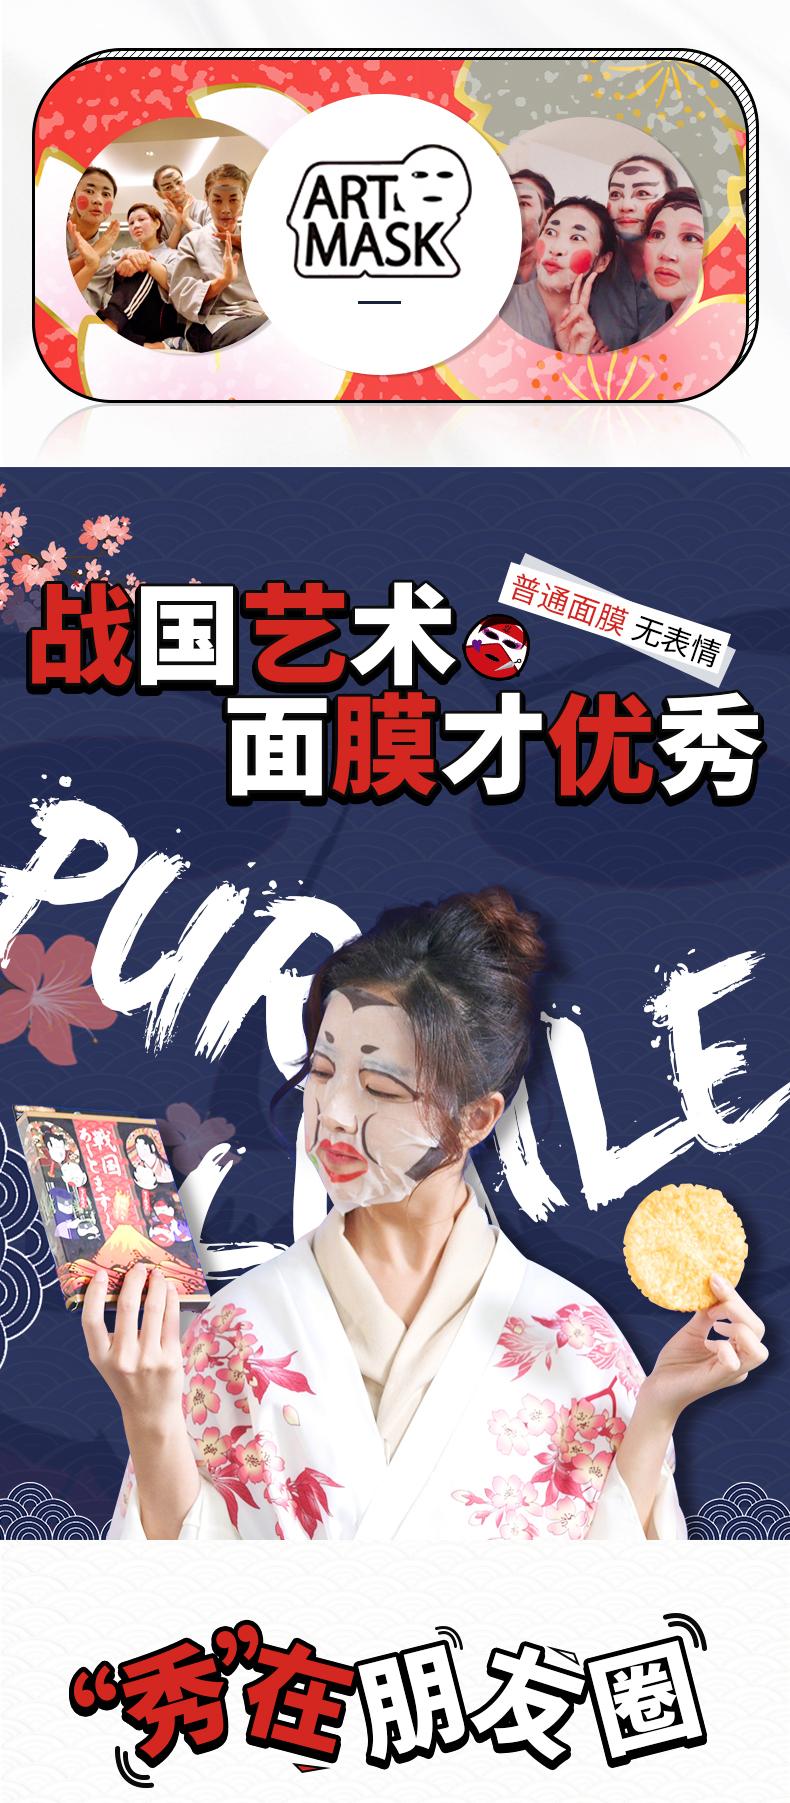 DM INTER美膚日本PureSmile江戶戰國彩繪臉譜面膜貼女補水保濕提亮膚色 4枚盒